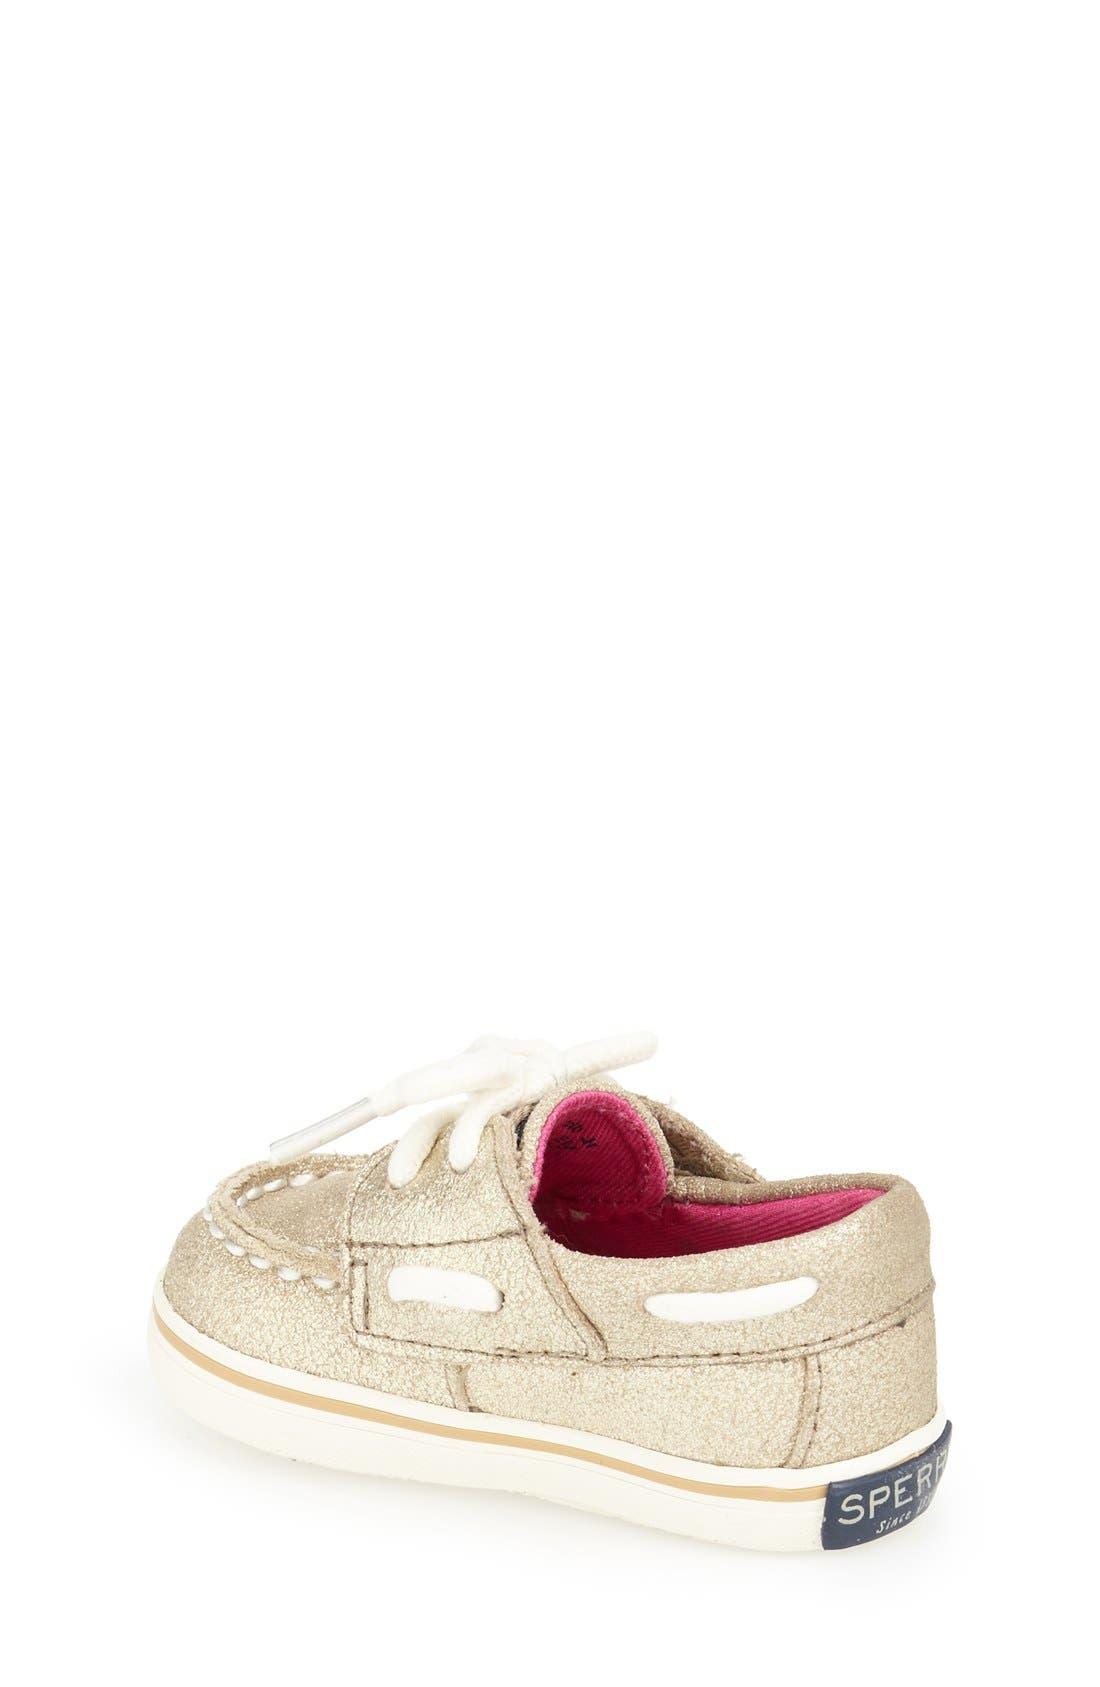 Alternate Image 2  - Sperry Kids 'Bahama' Crib Shoe (Baby)